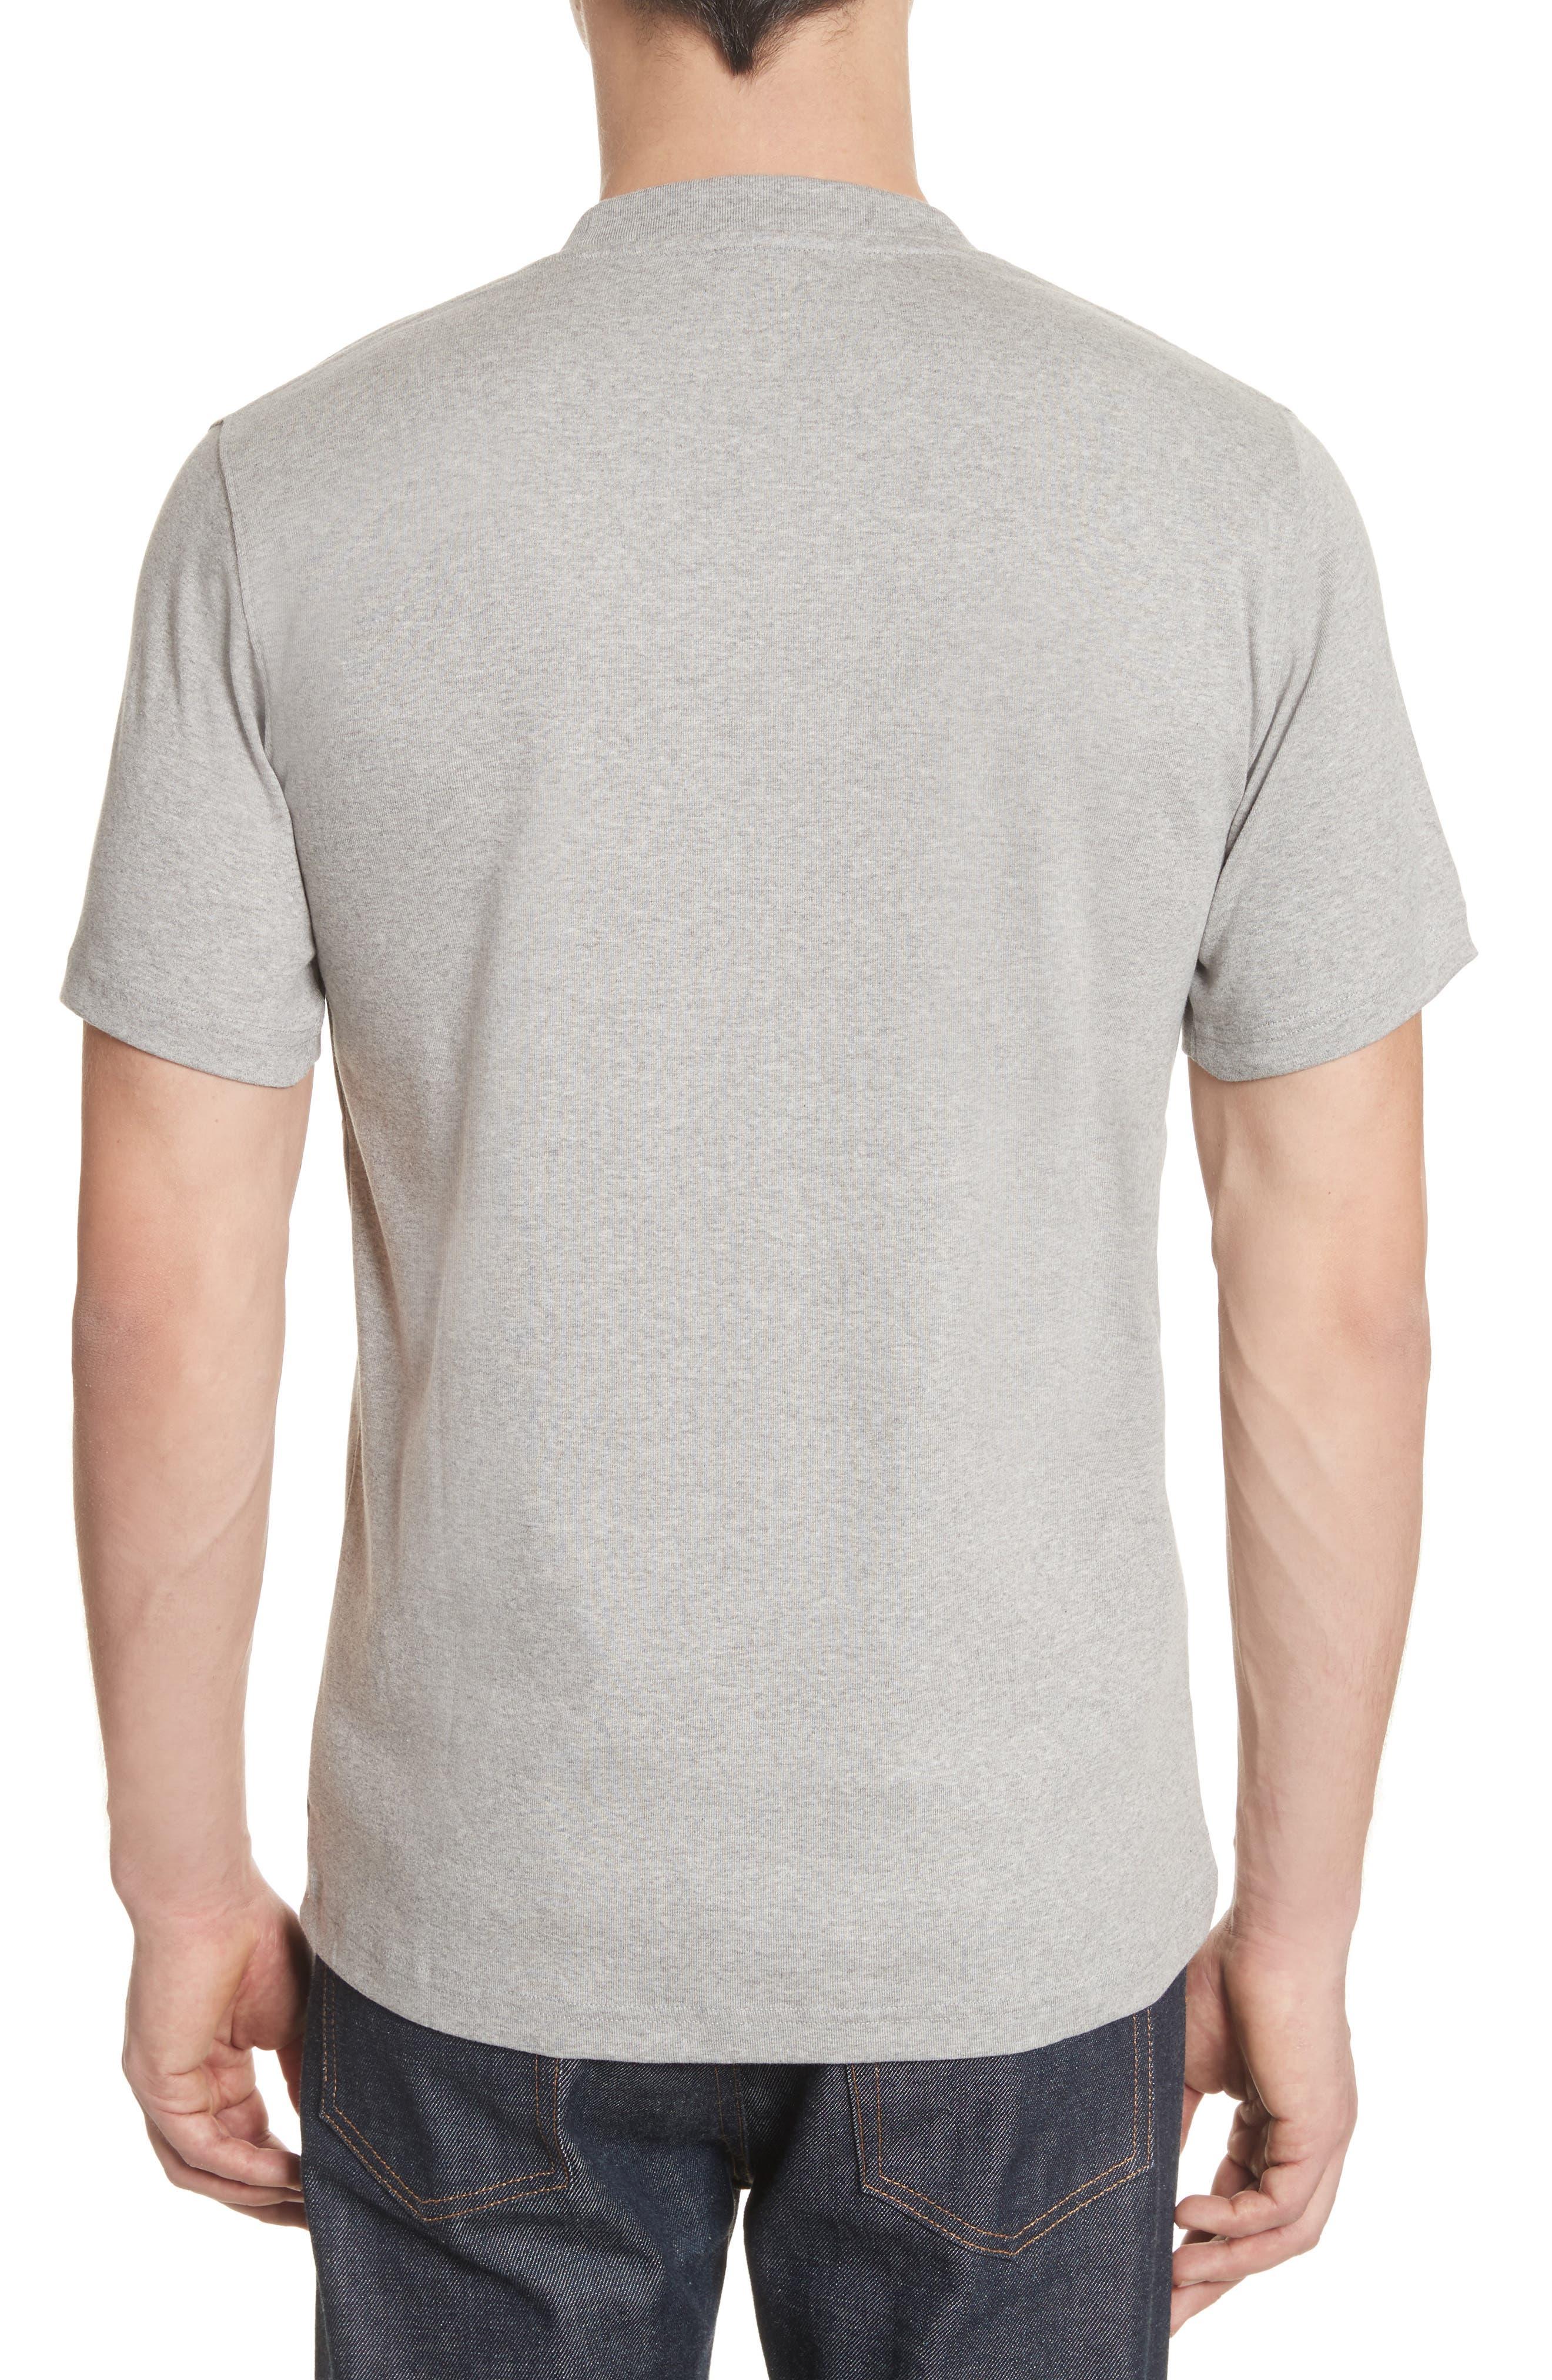 James T-Shirt,                             Alternate thumbnail 2, color,                             021